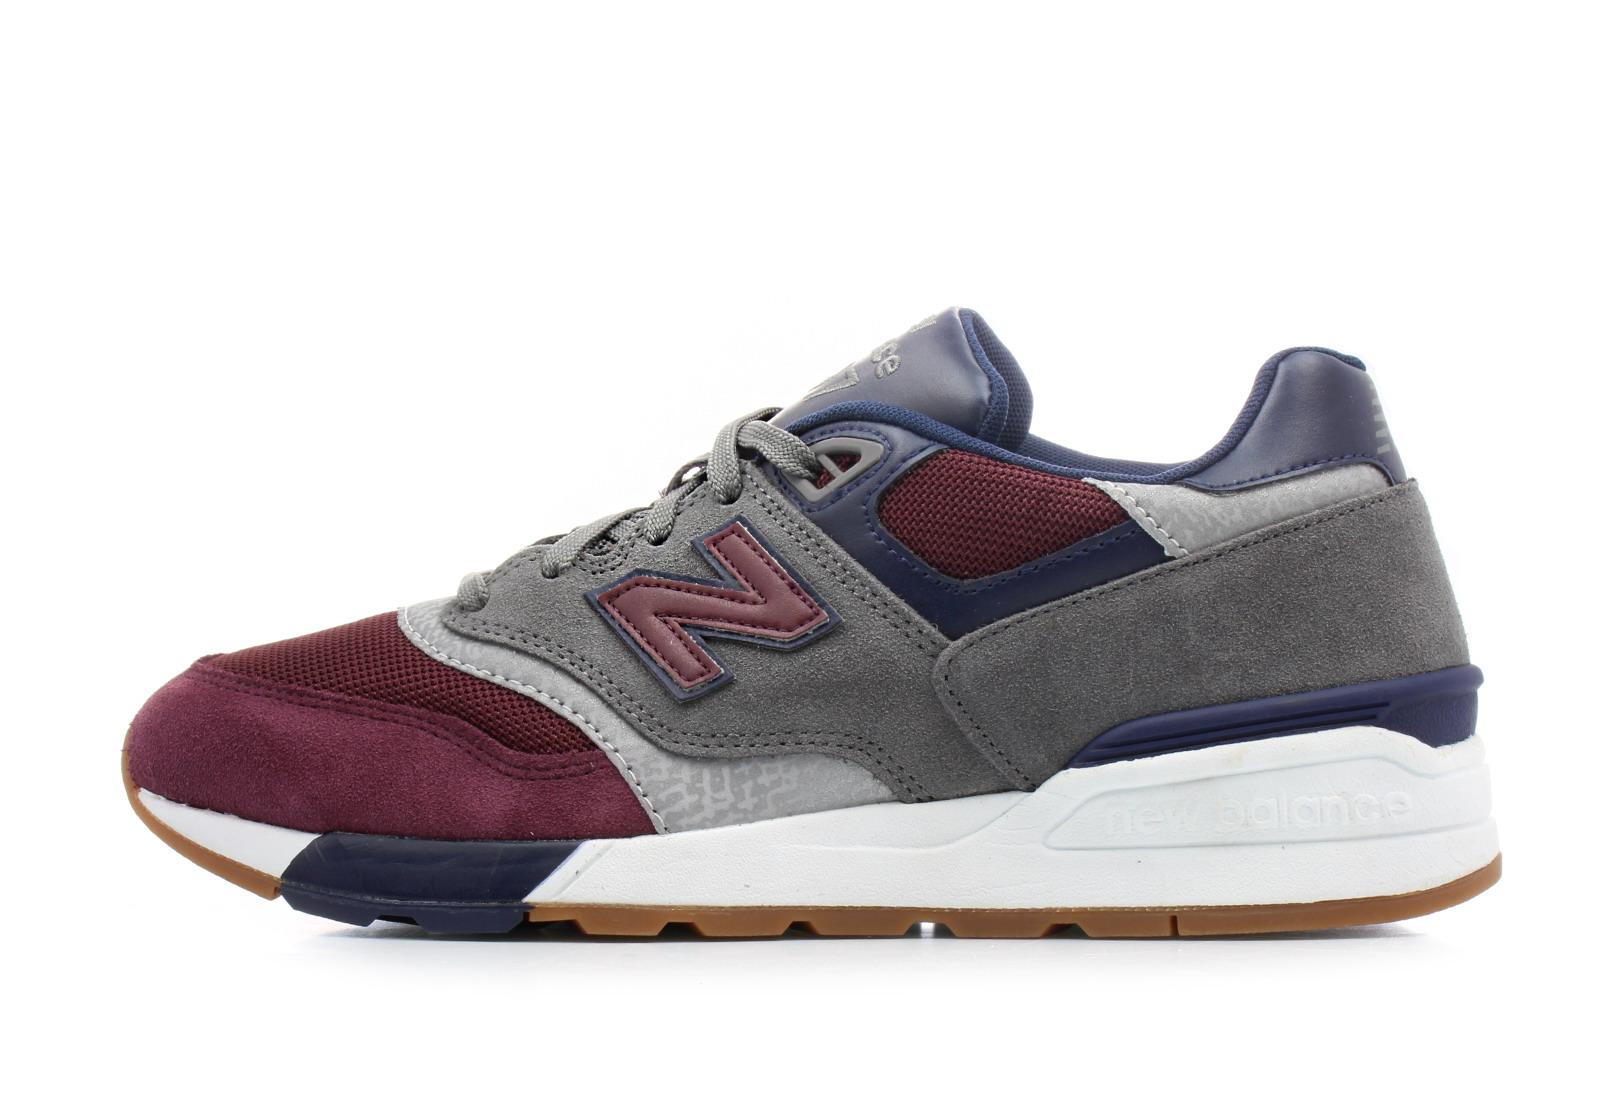 b44a39525ca New Balance Niske Cipele Sive Cipele - Ml597 - Office Shoes - Online  trgovina obuće